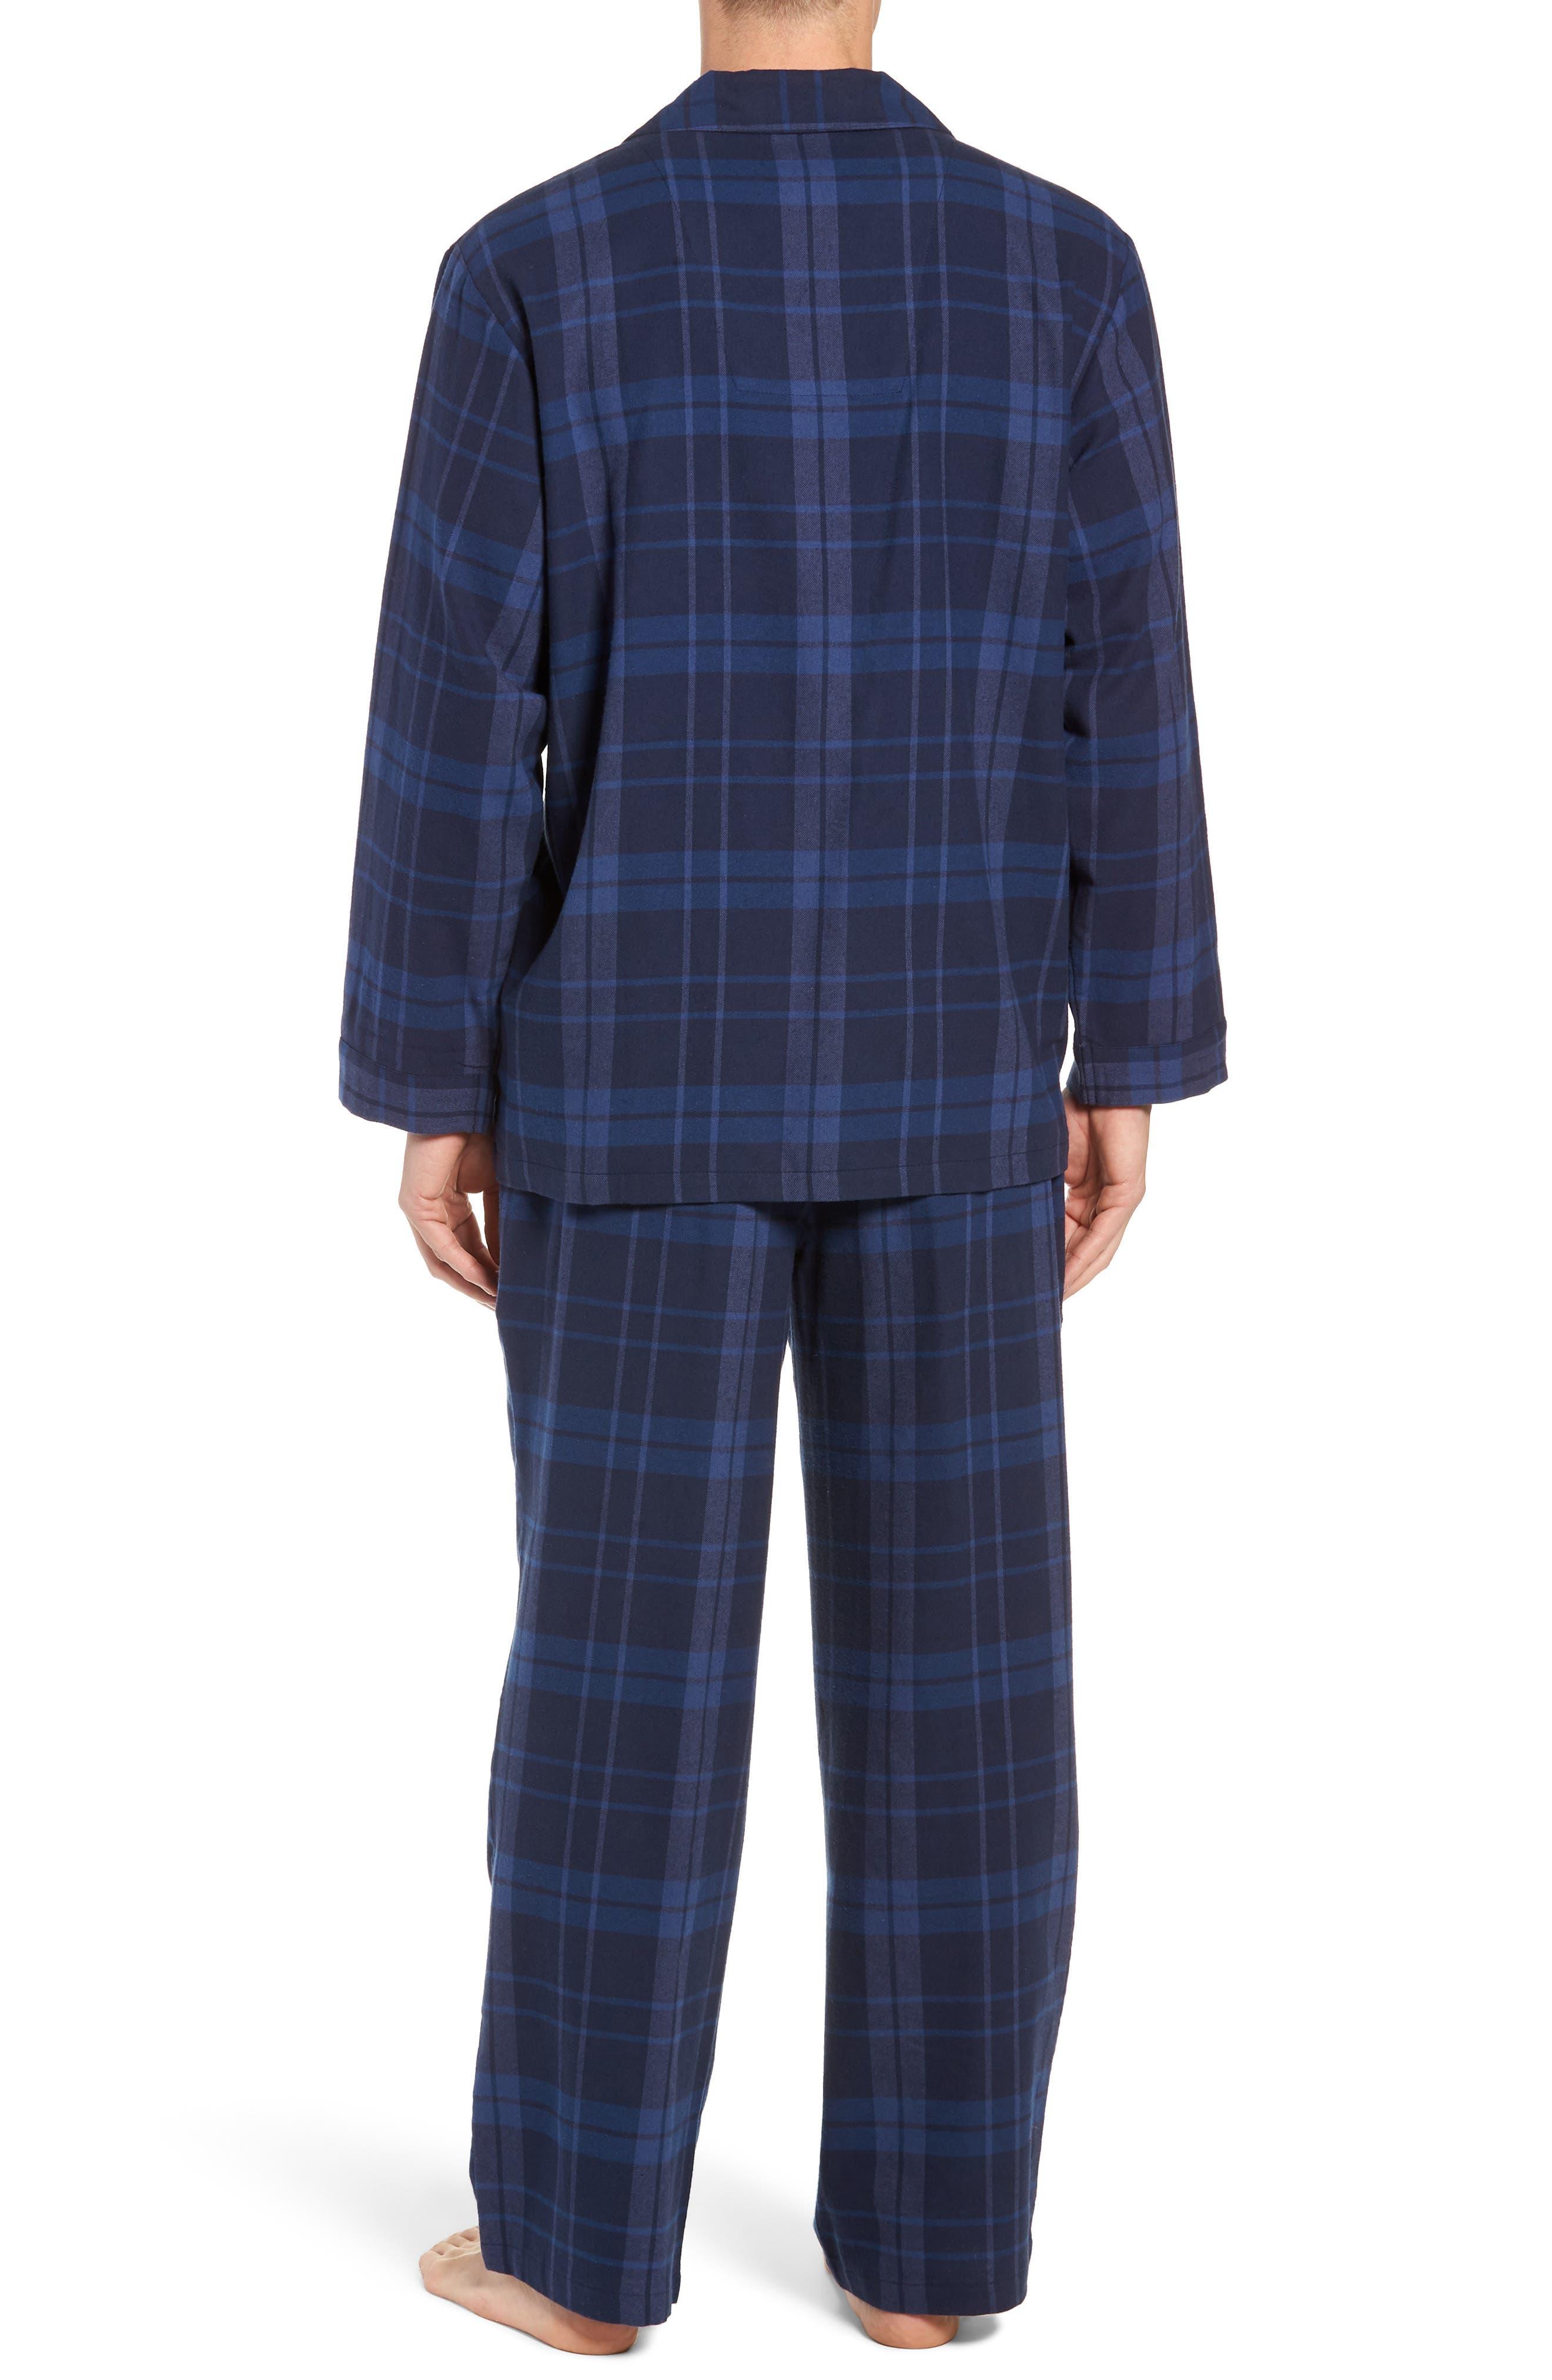 '824' Flannel Pajama Set,                             Alternate thumbnail 36, color,